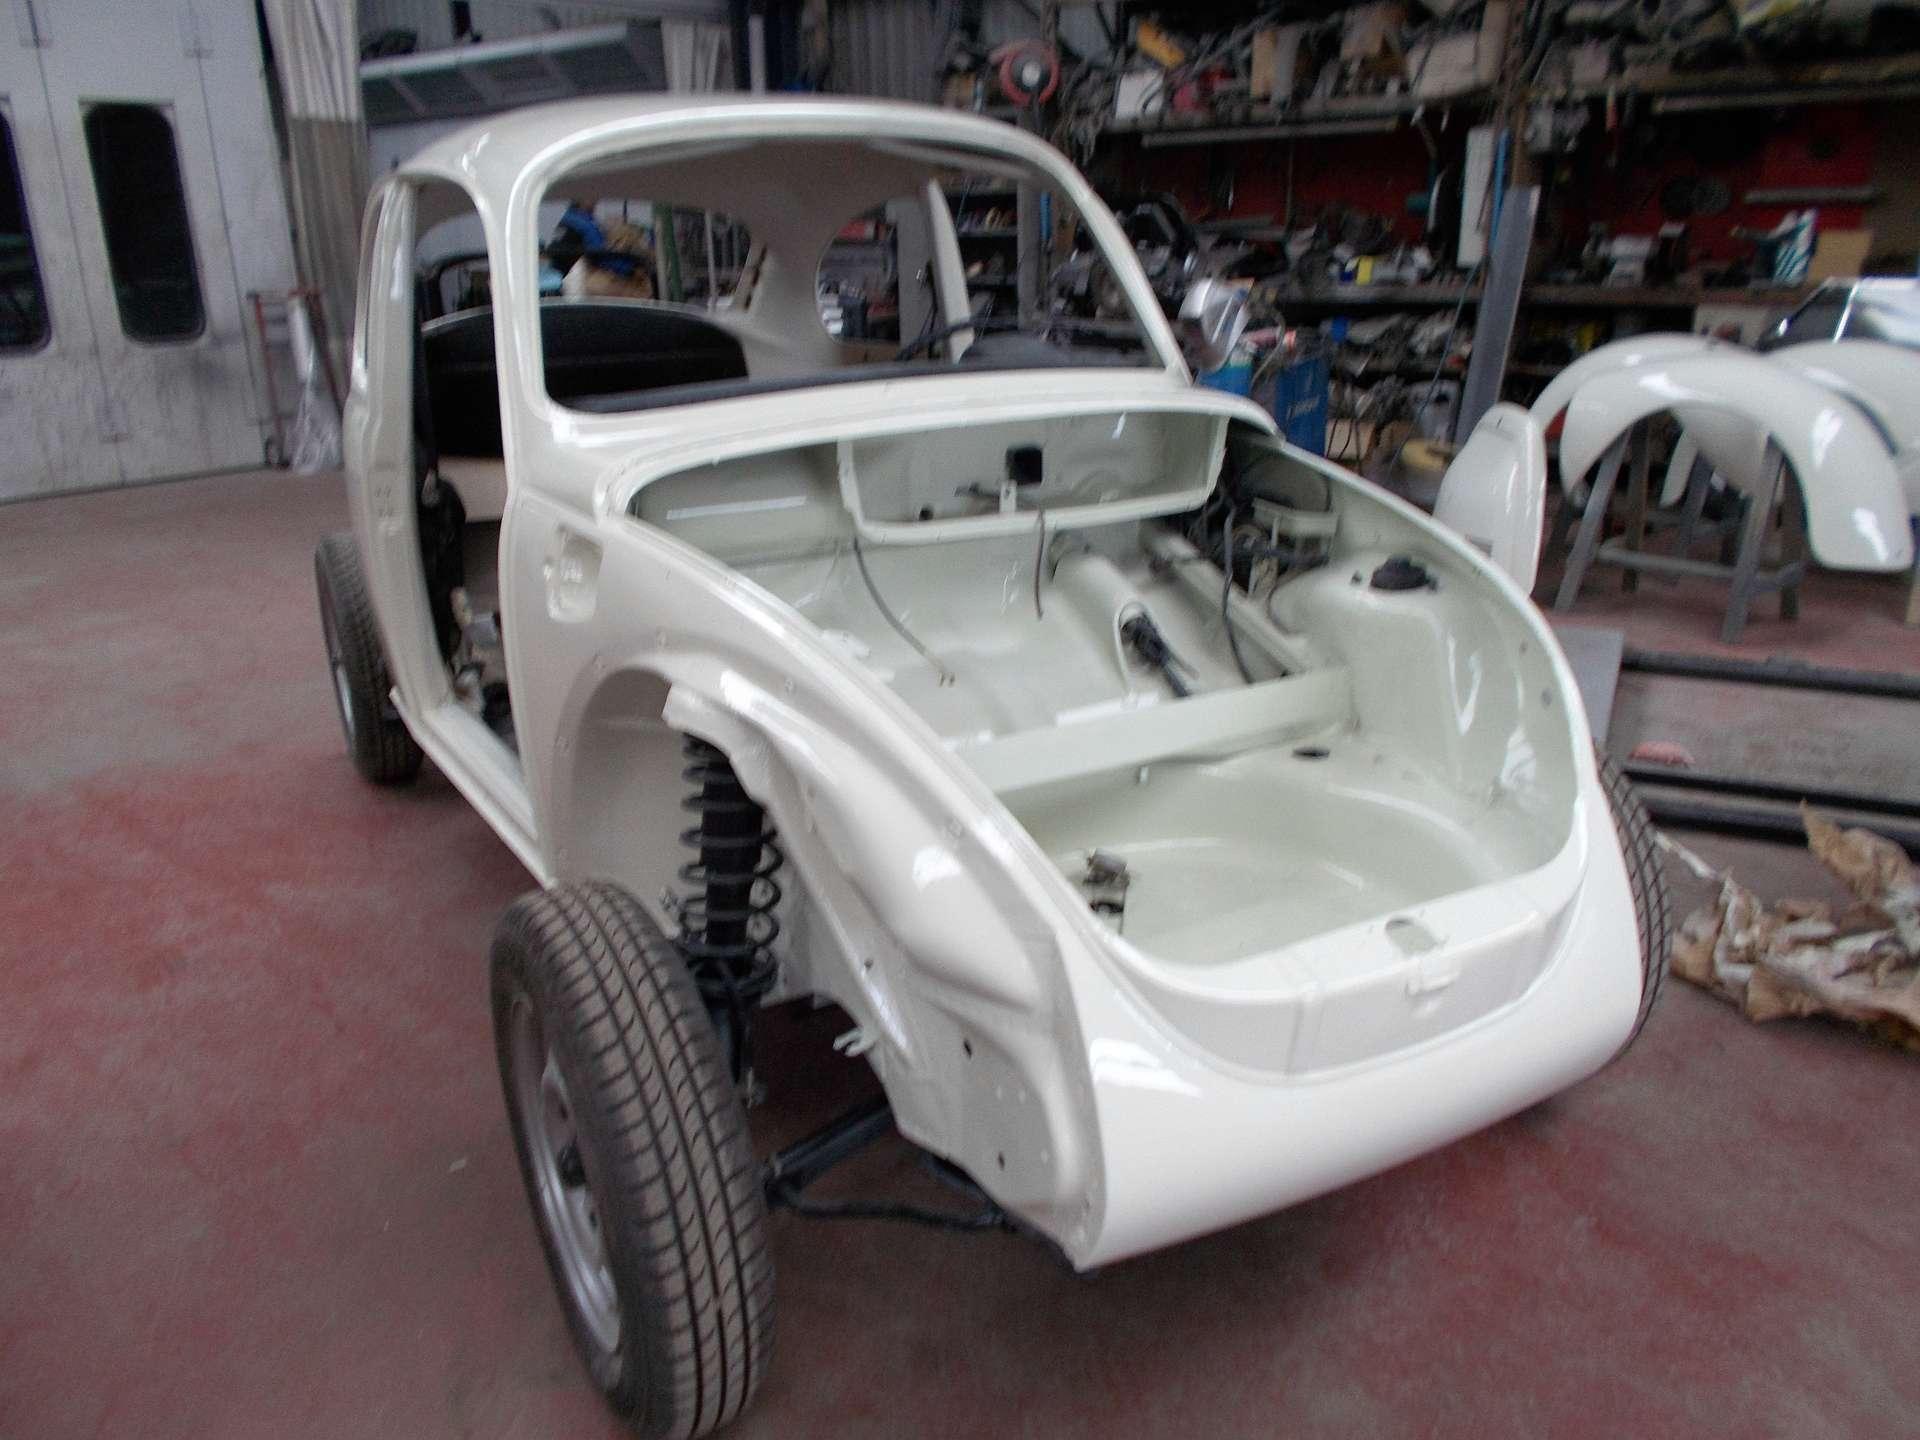 VW-COX-PHILIPPE-110-Copie-Copie-1